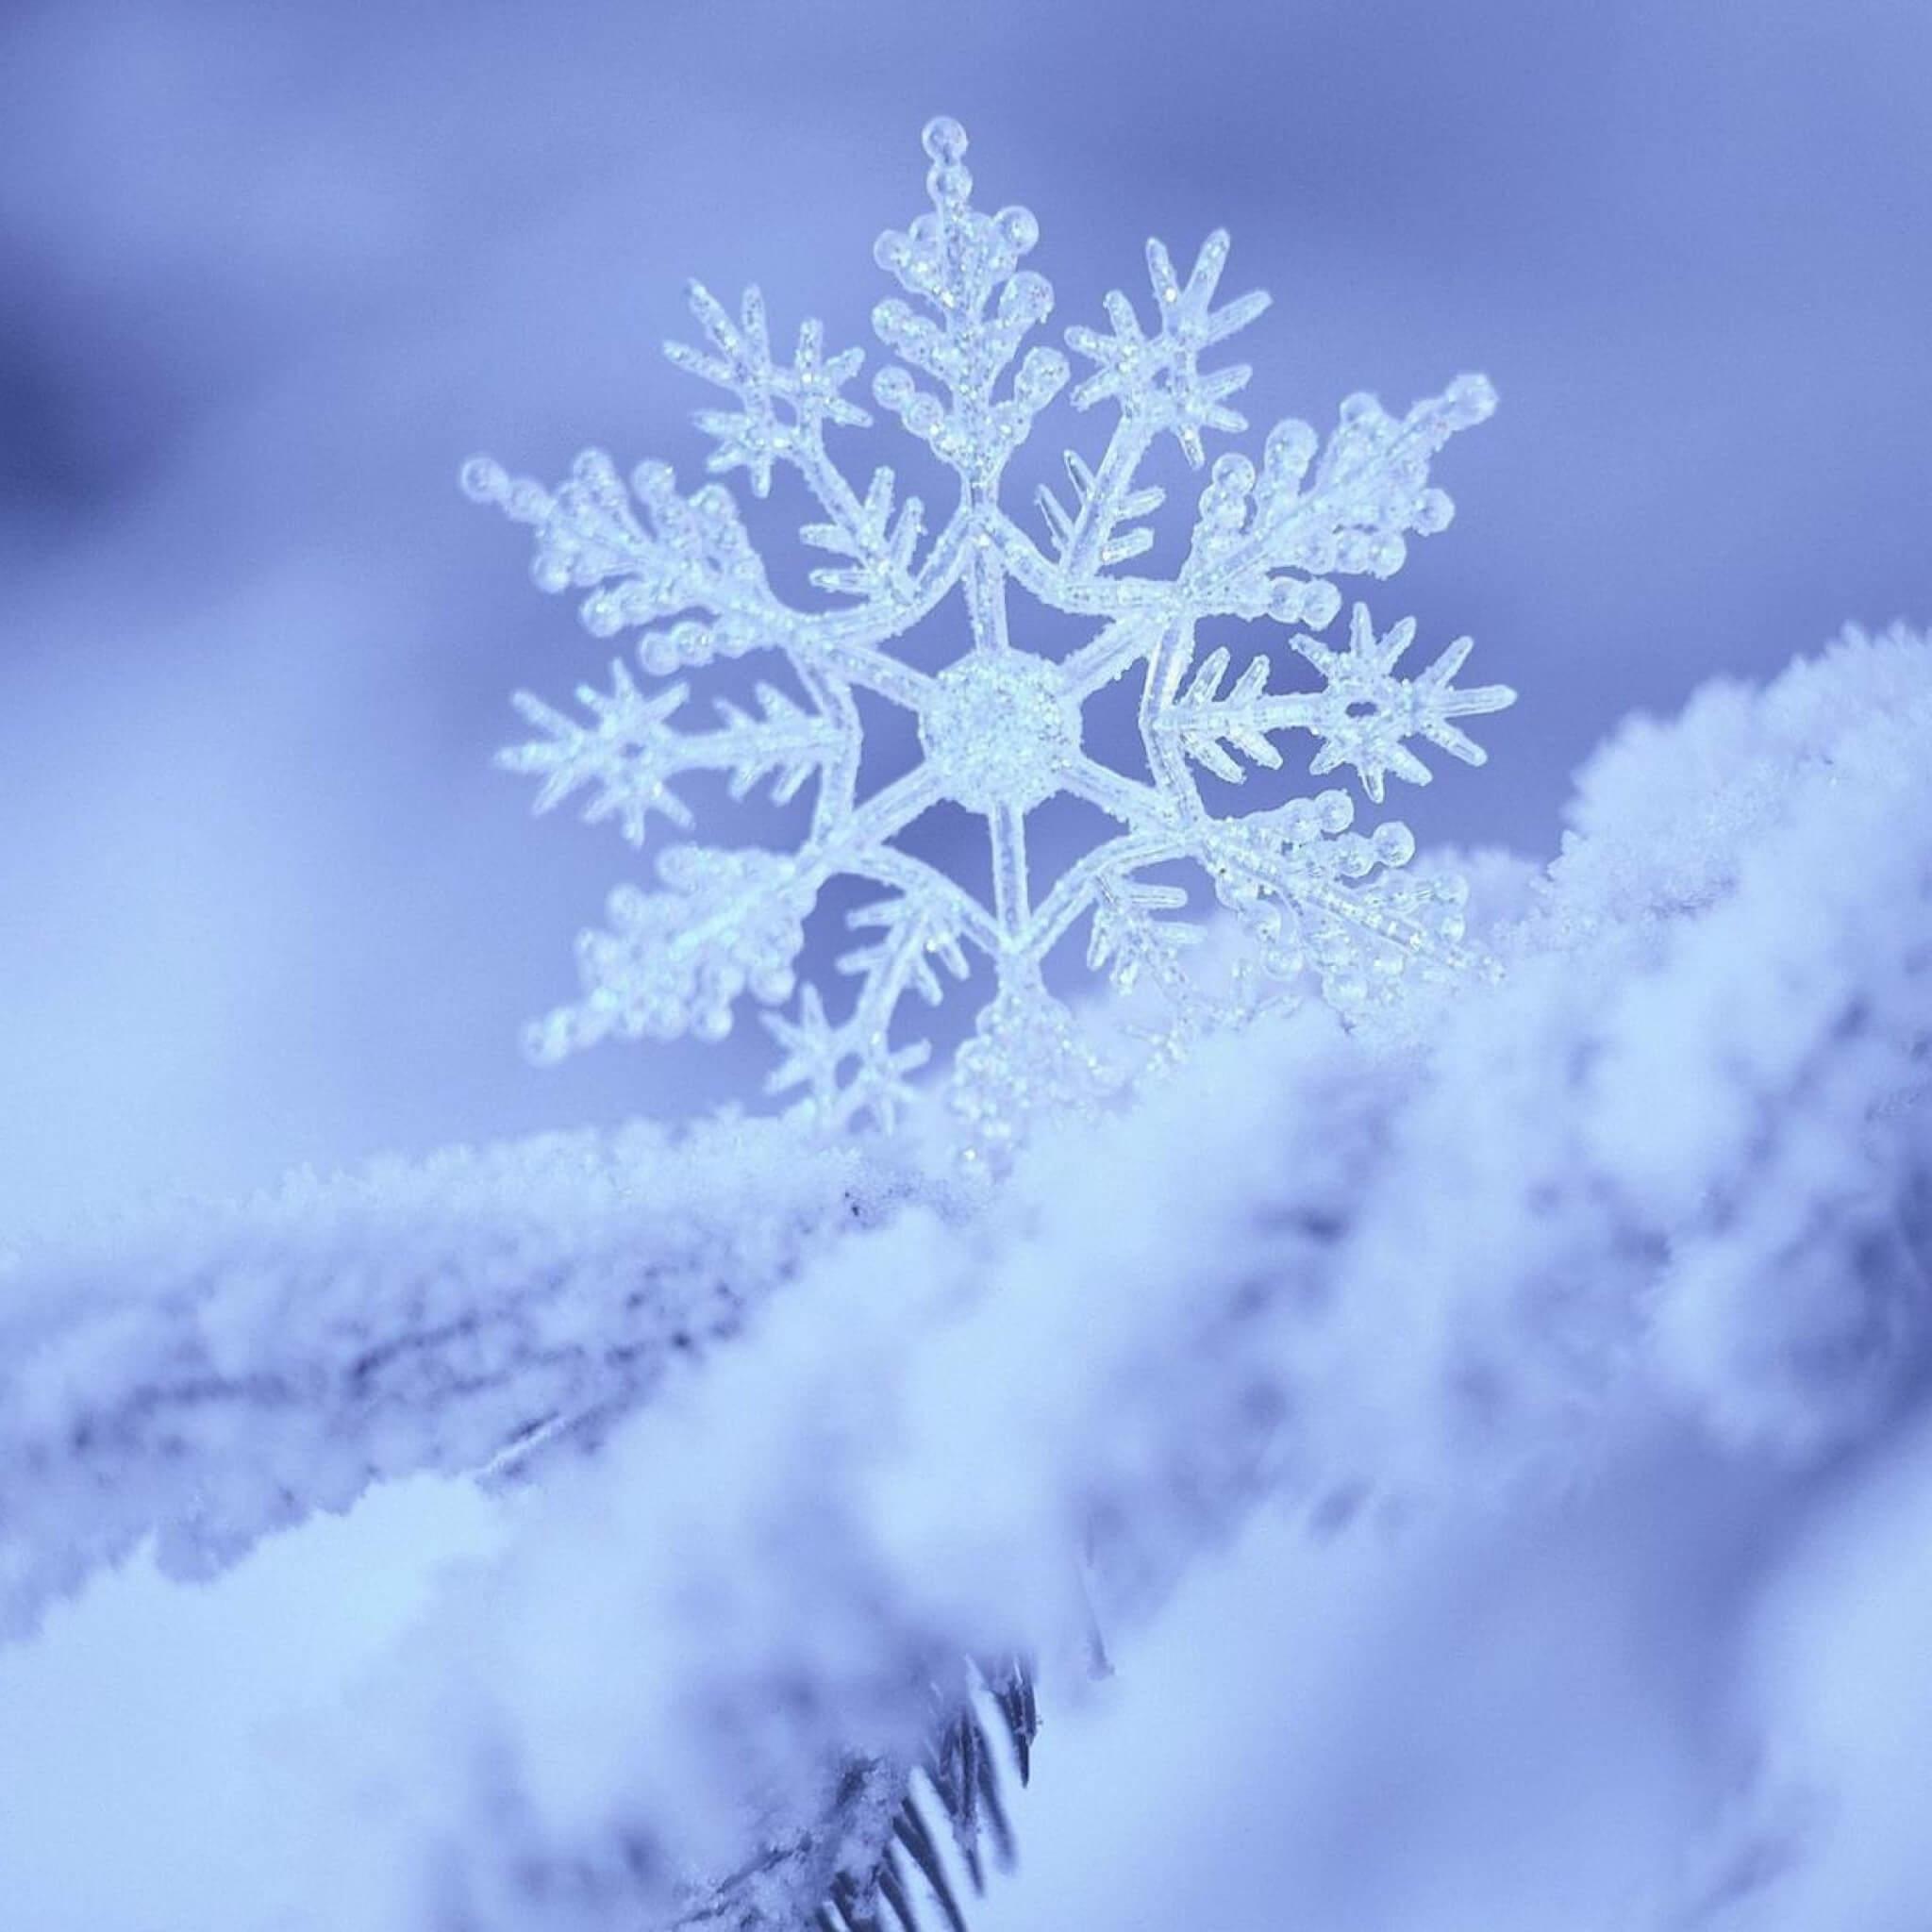 snow_snowflake_winter_form_pattern_49405_2048x2048